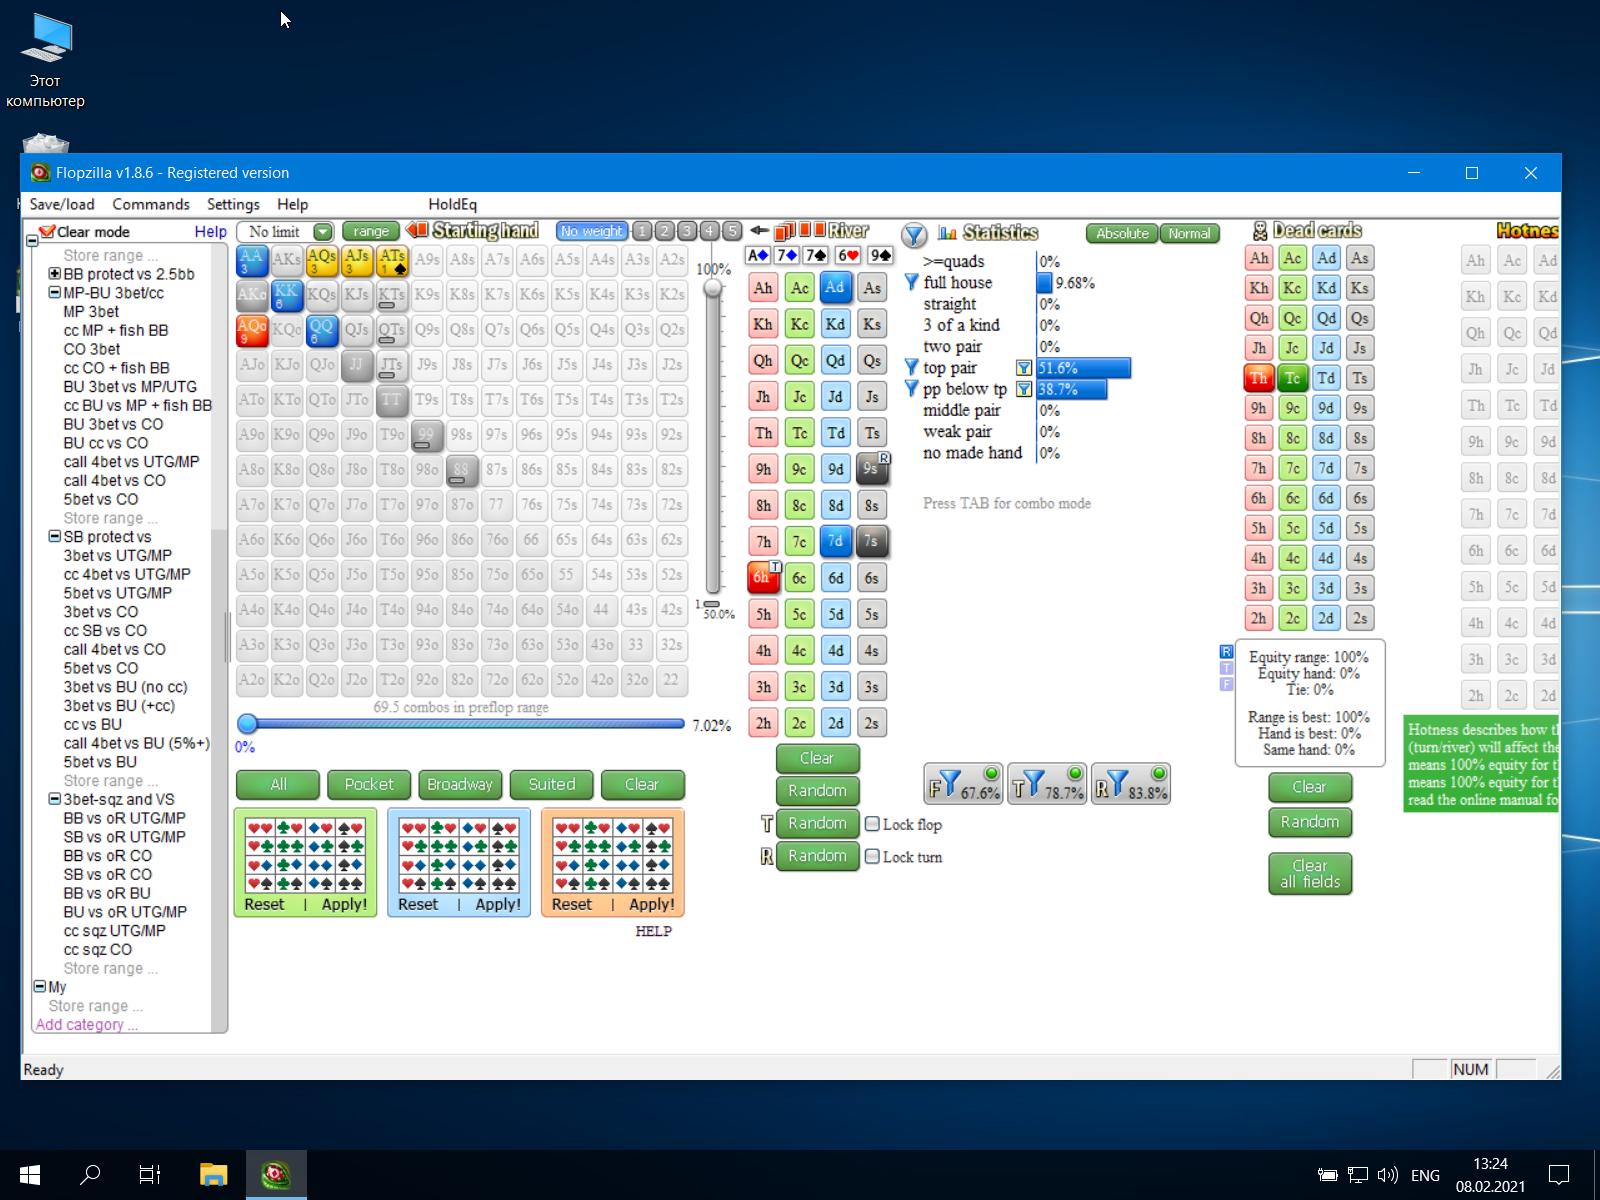 virtualboxwin-10080220211325001612779923.png